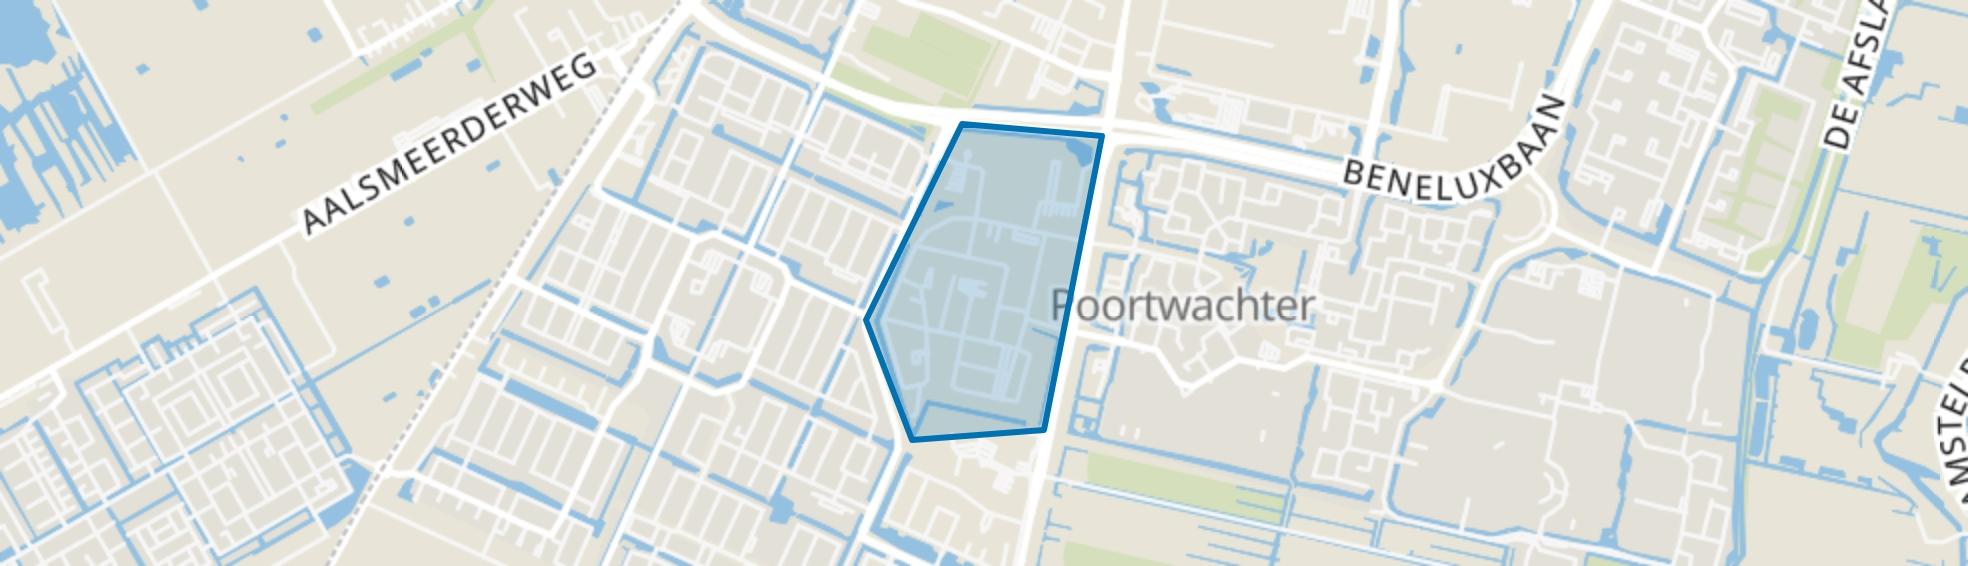 Legmeer, Amstelveen map